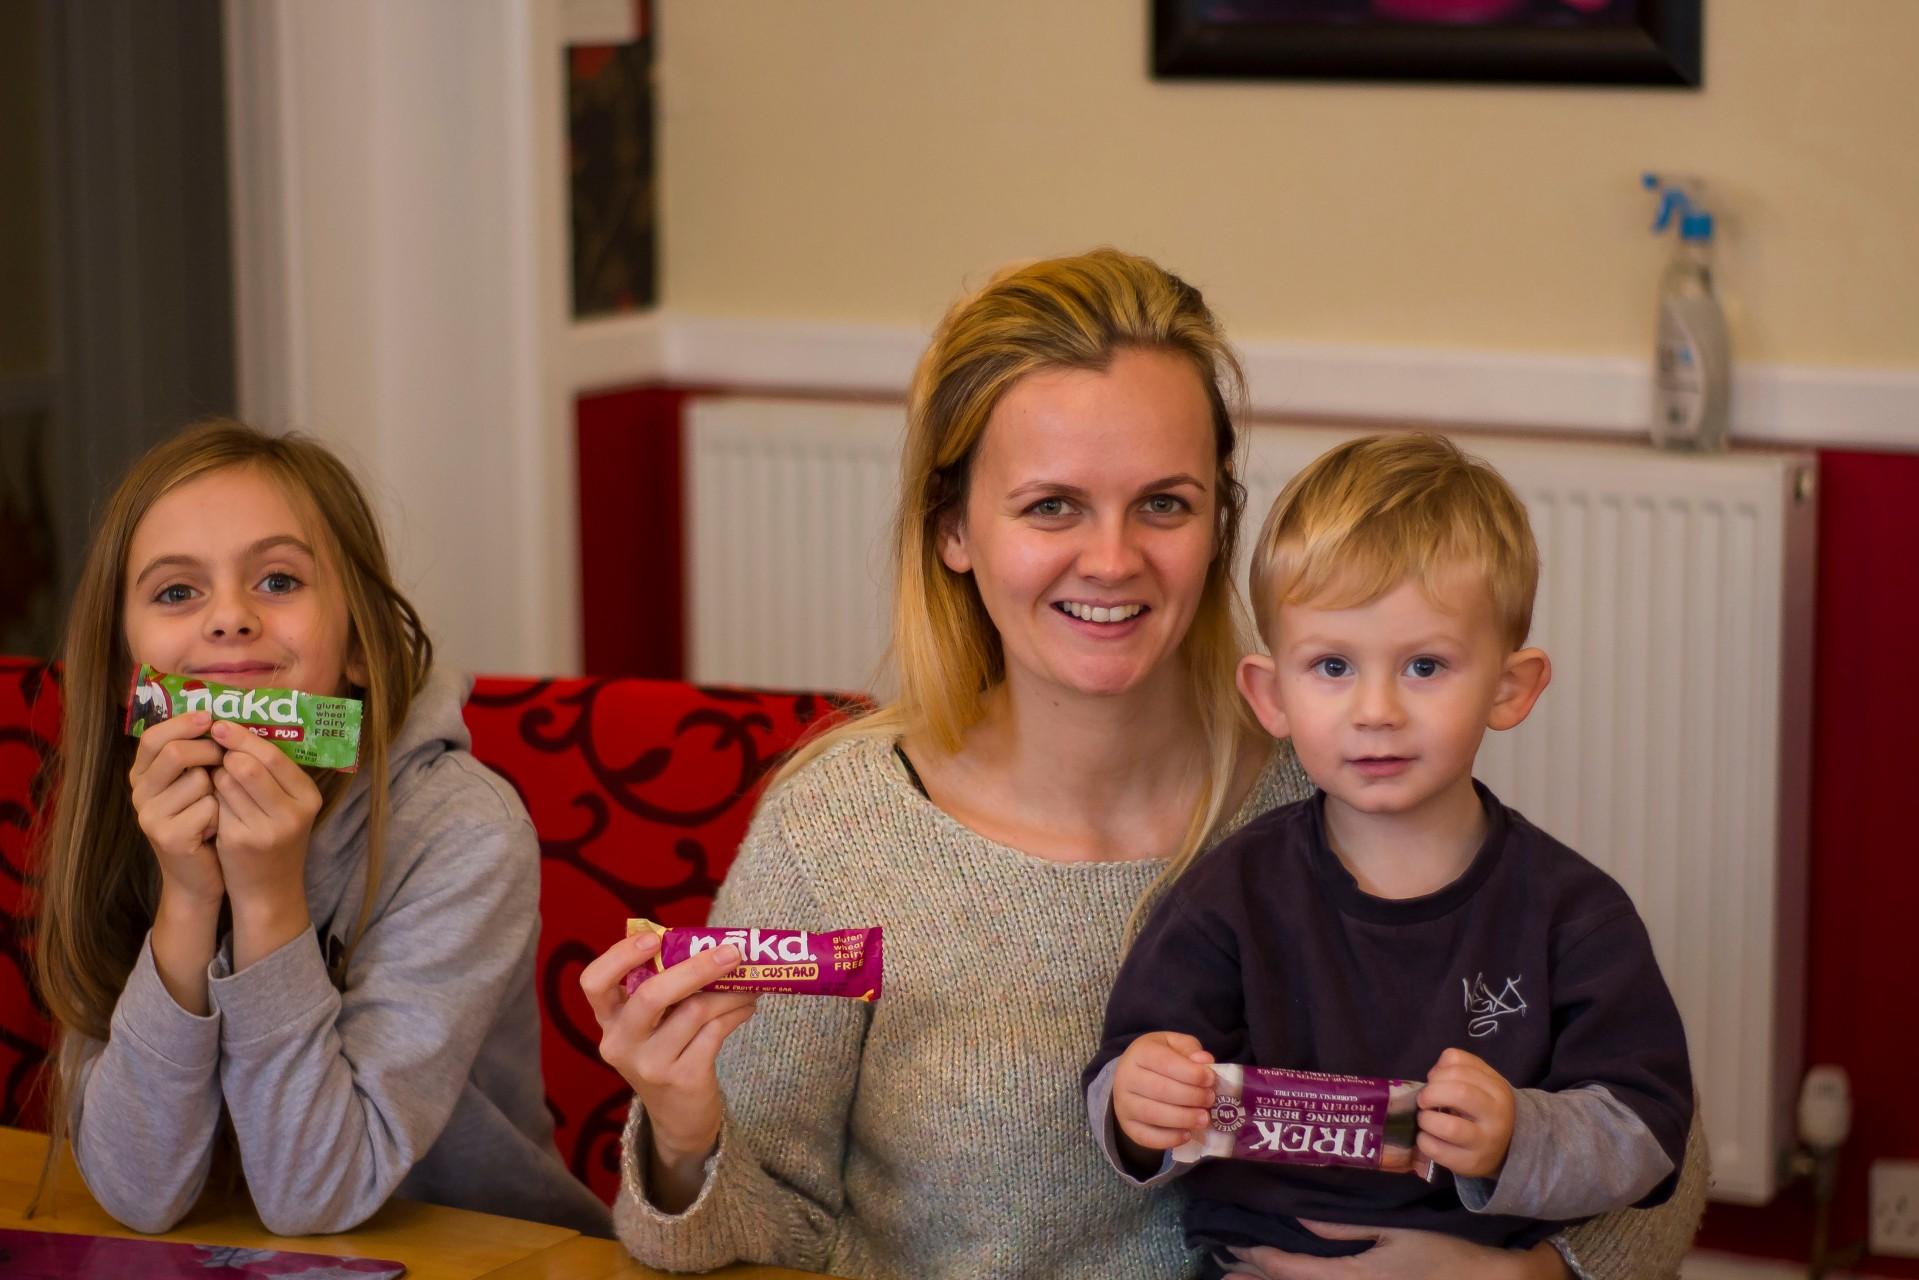 taste testing nakd healthy snacks with the family